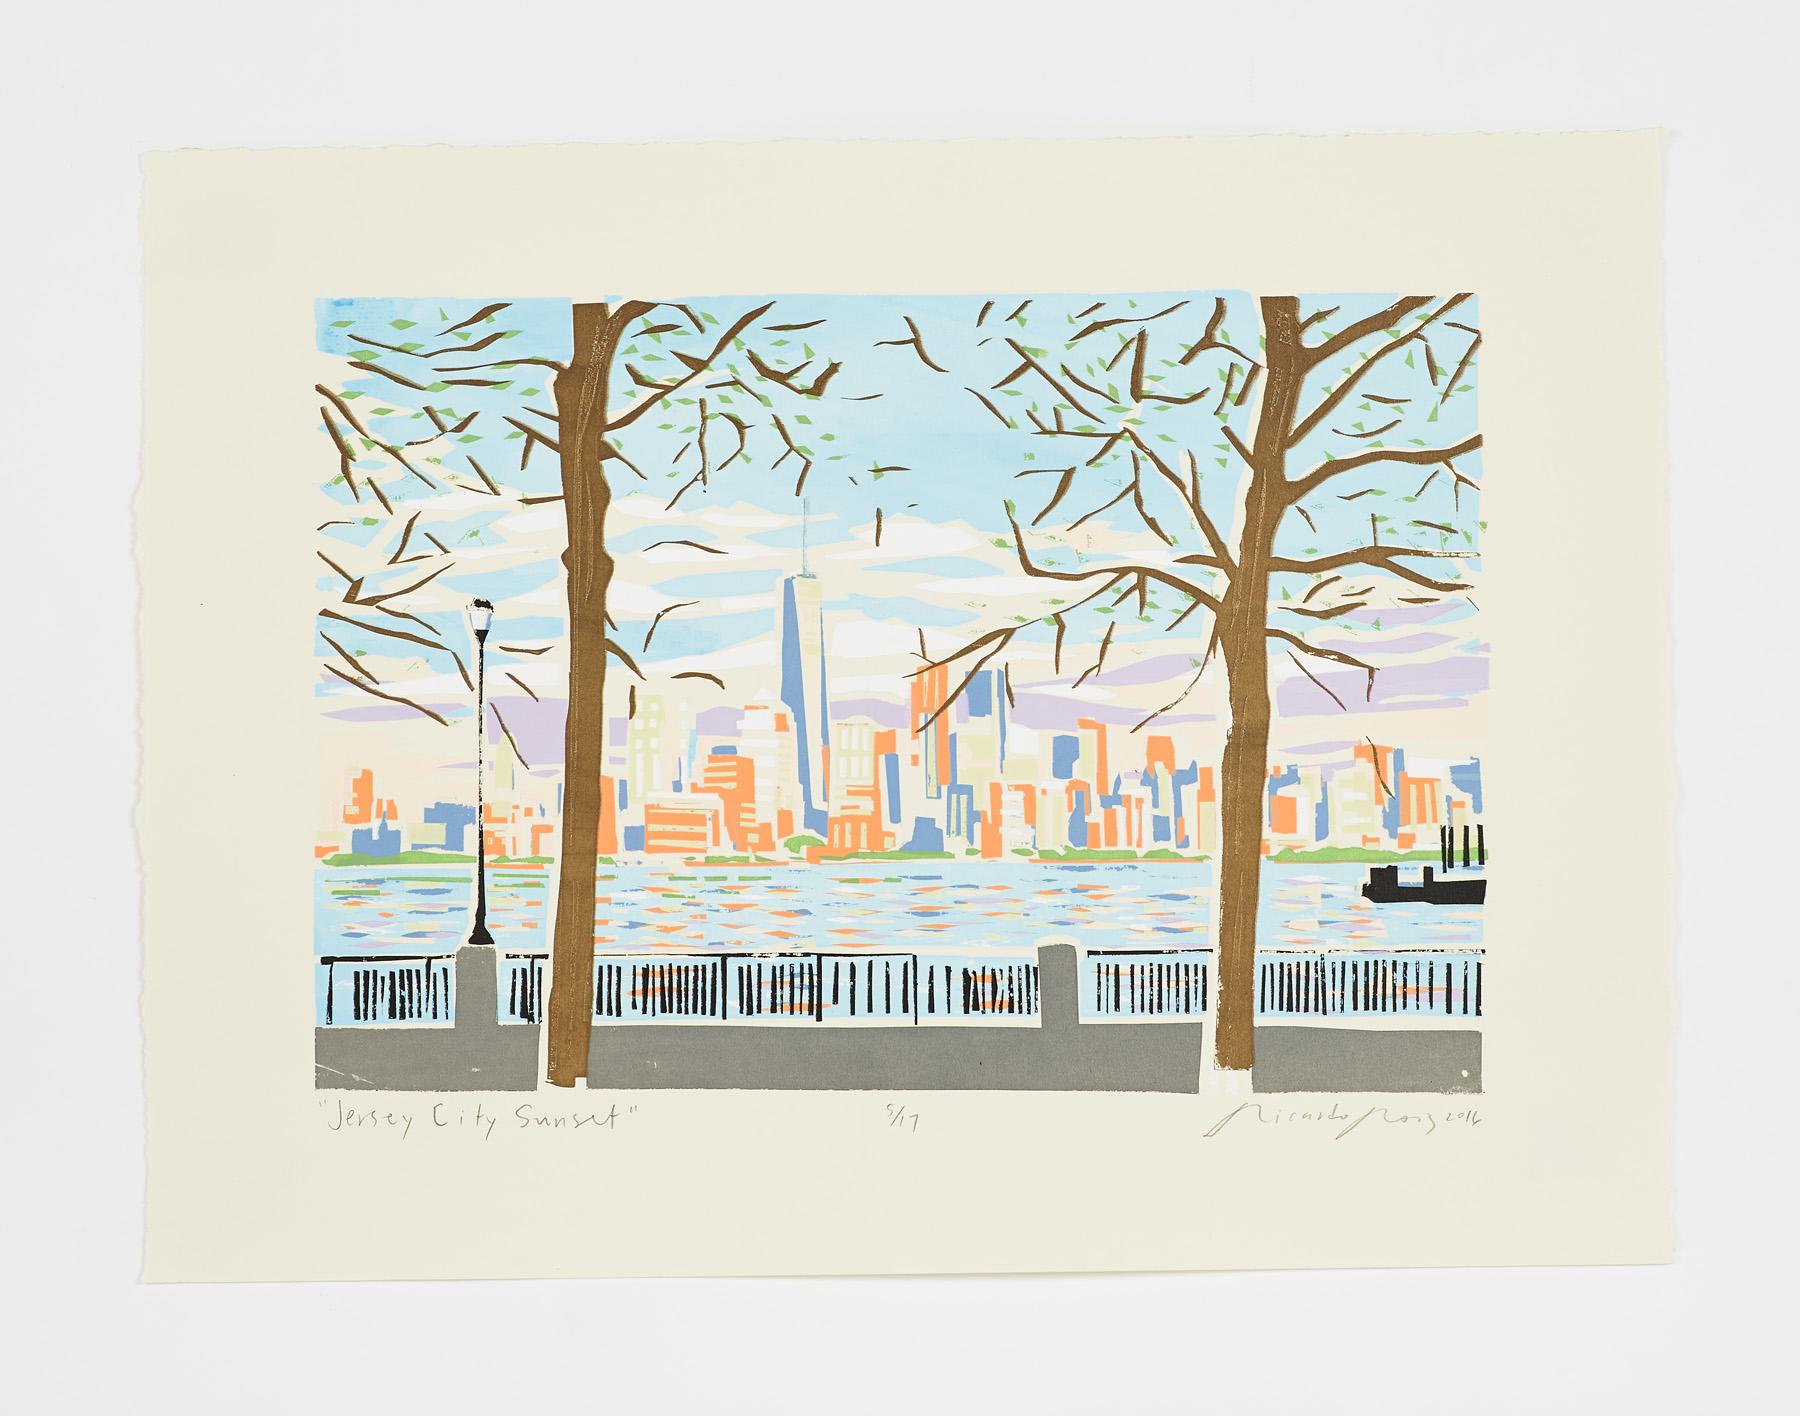 """Jersey City Sunset"" 2016"